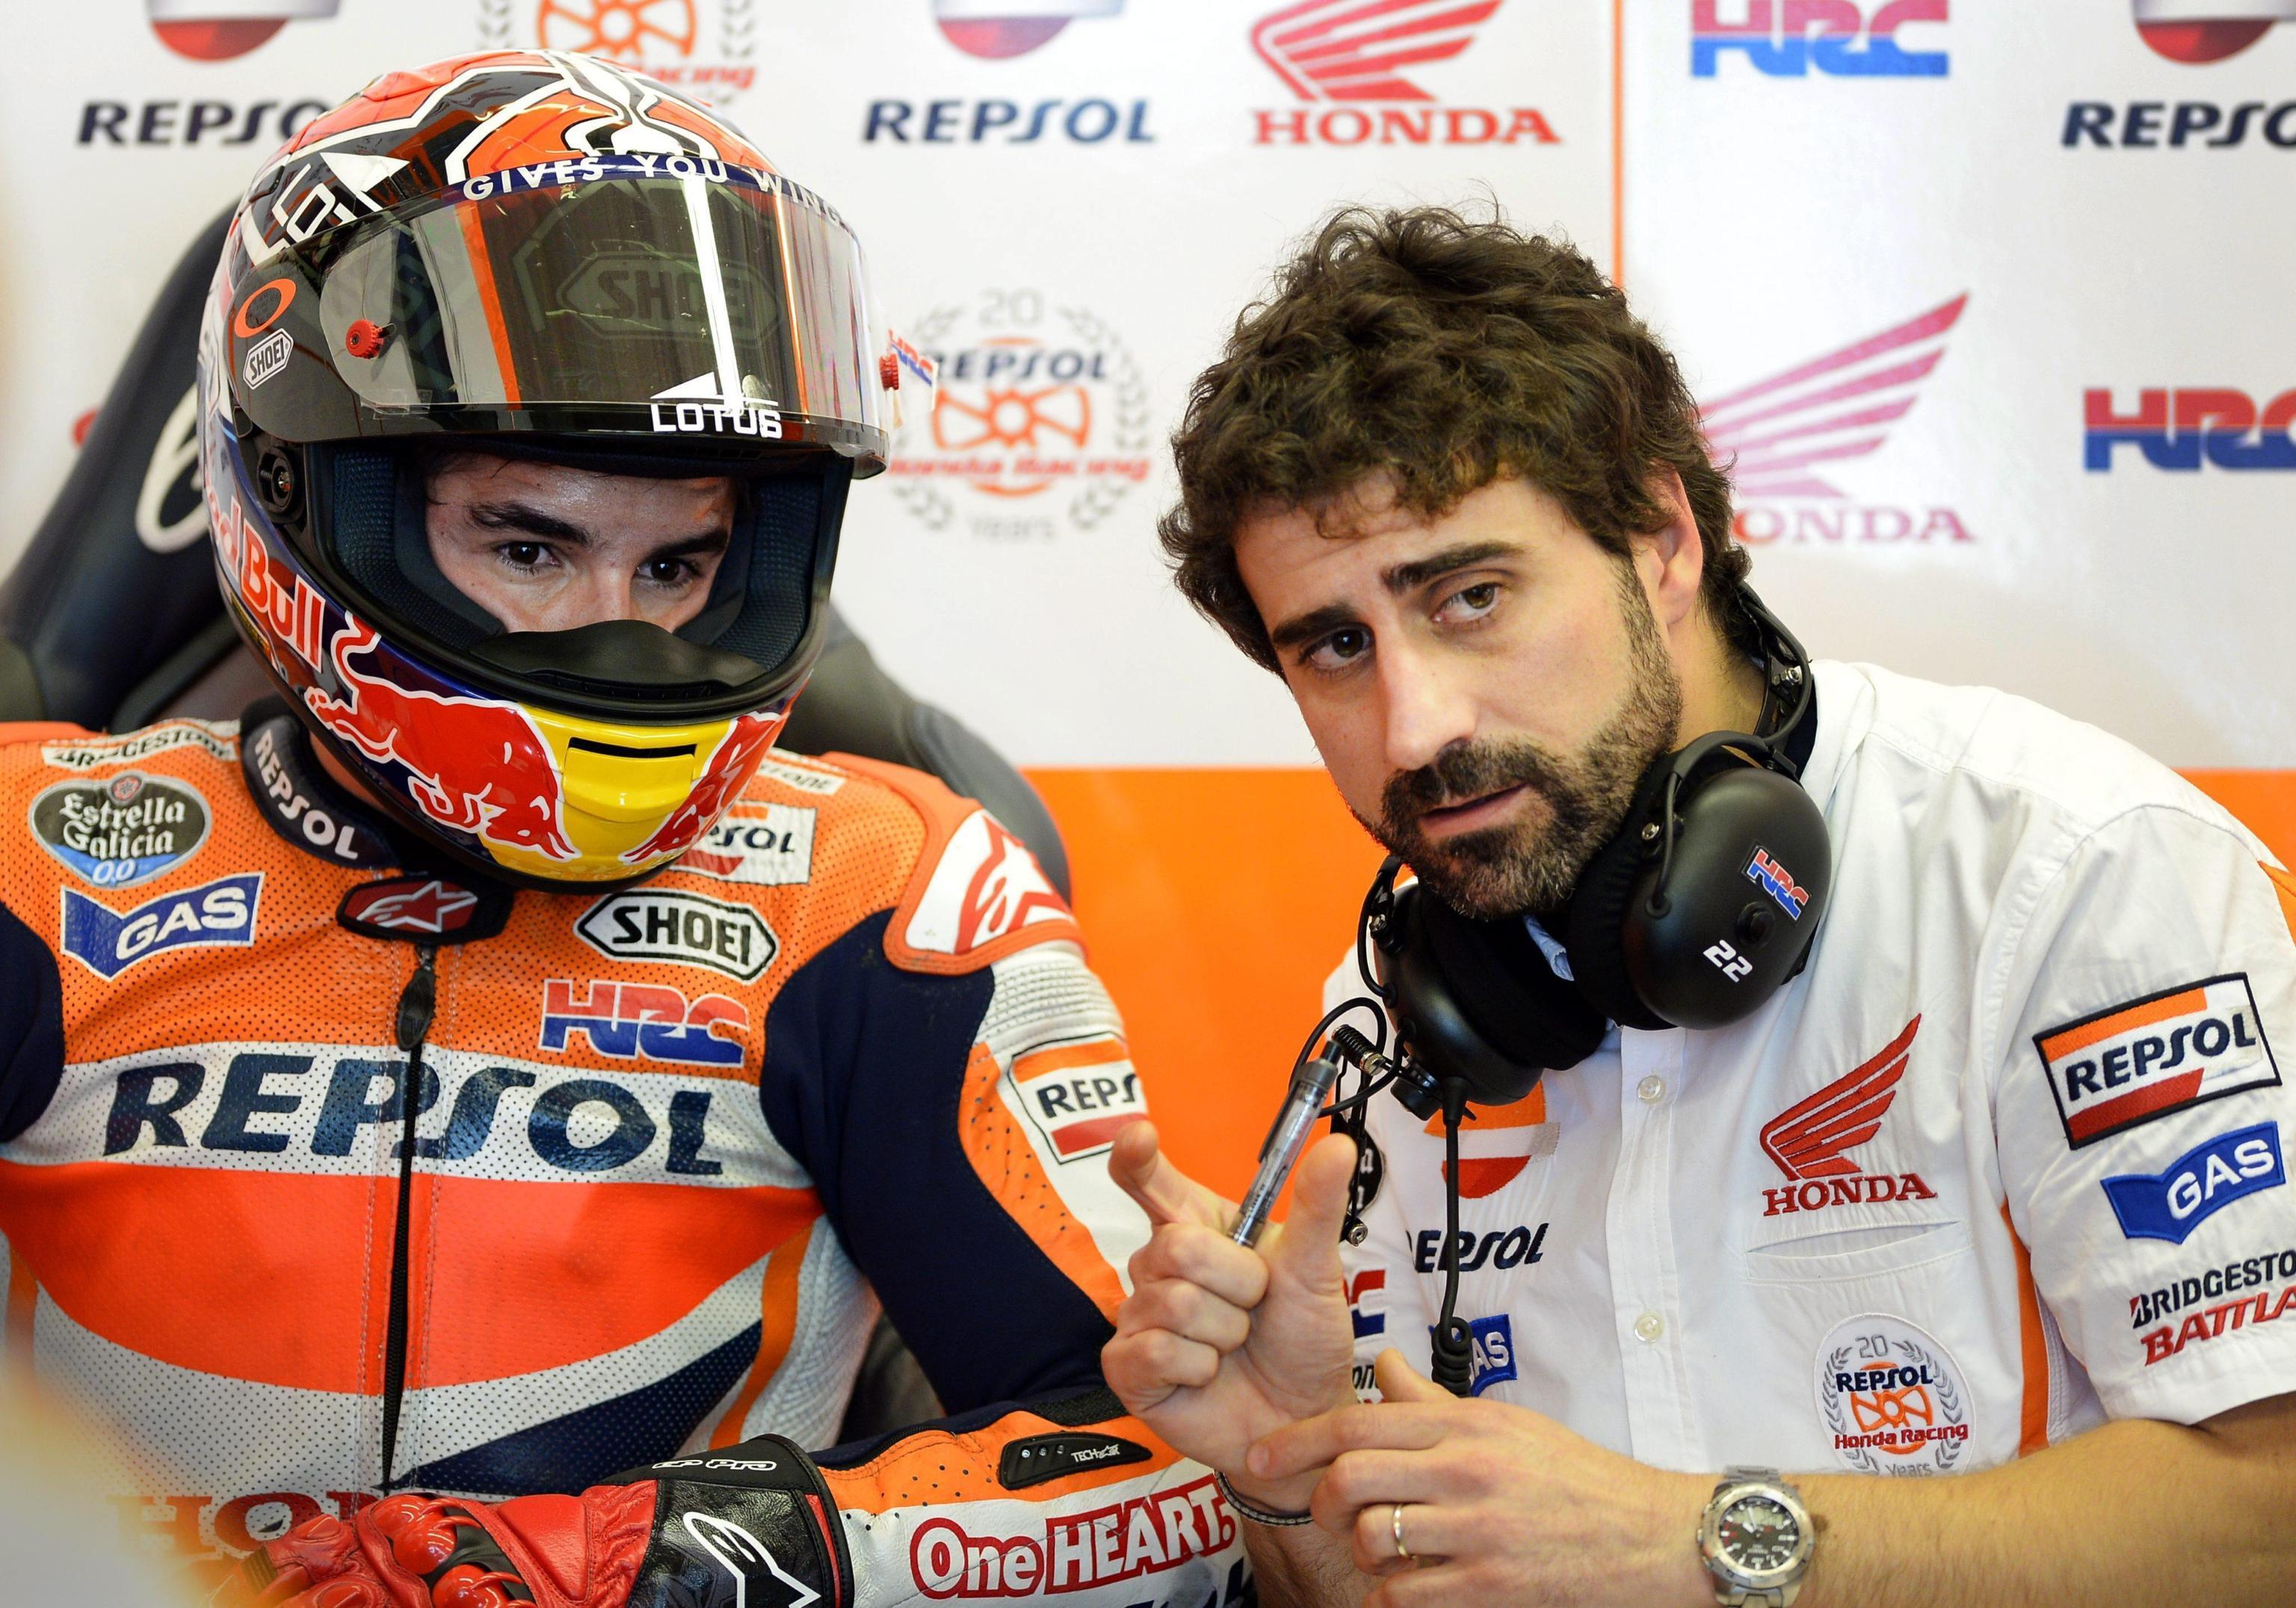 MotoGp, Marquez imprendibile. Le foto di un Week-end da record - Photogallery - Rai News